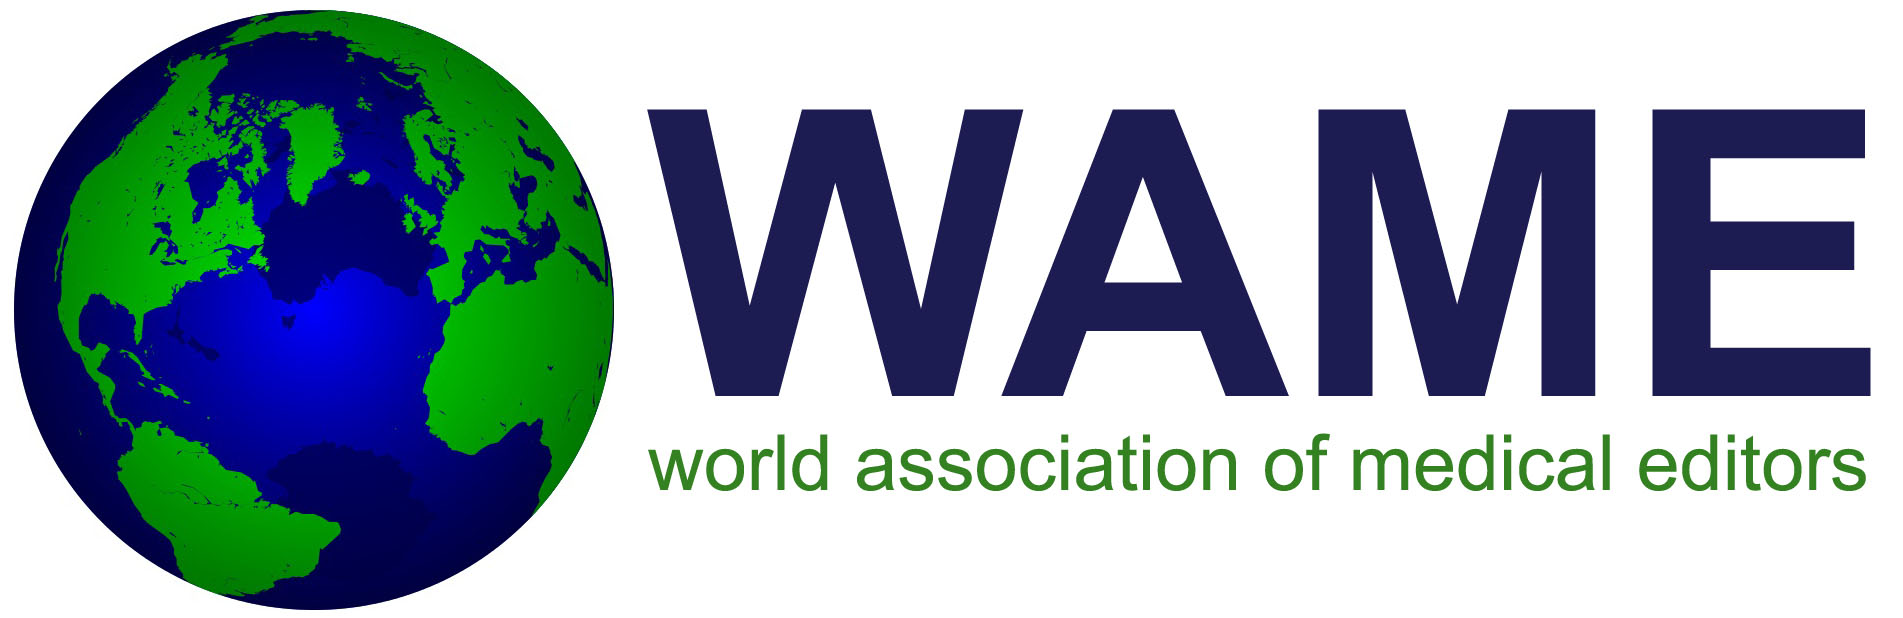 World Association of Medical Editors logo